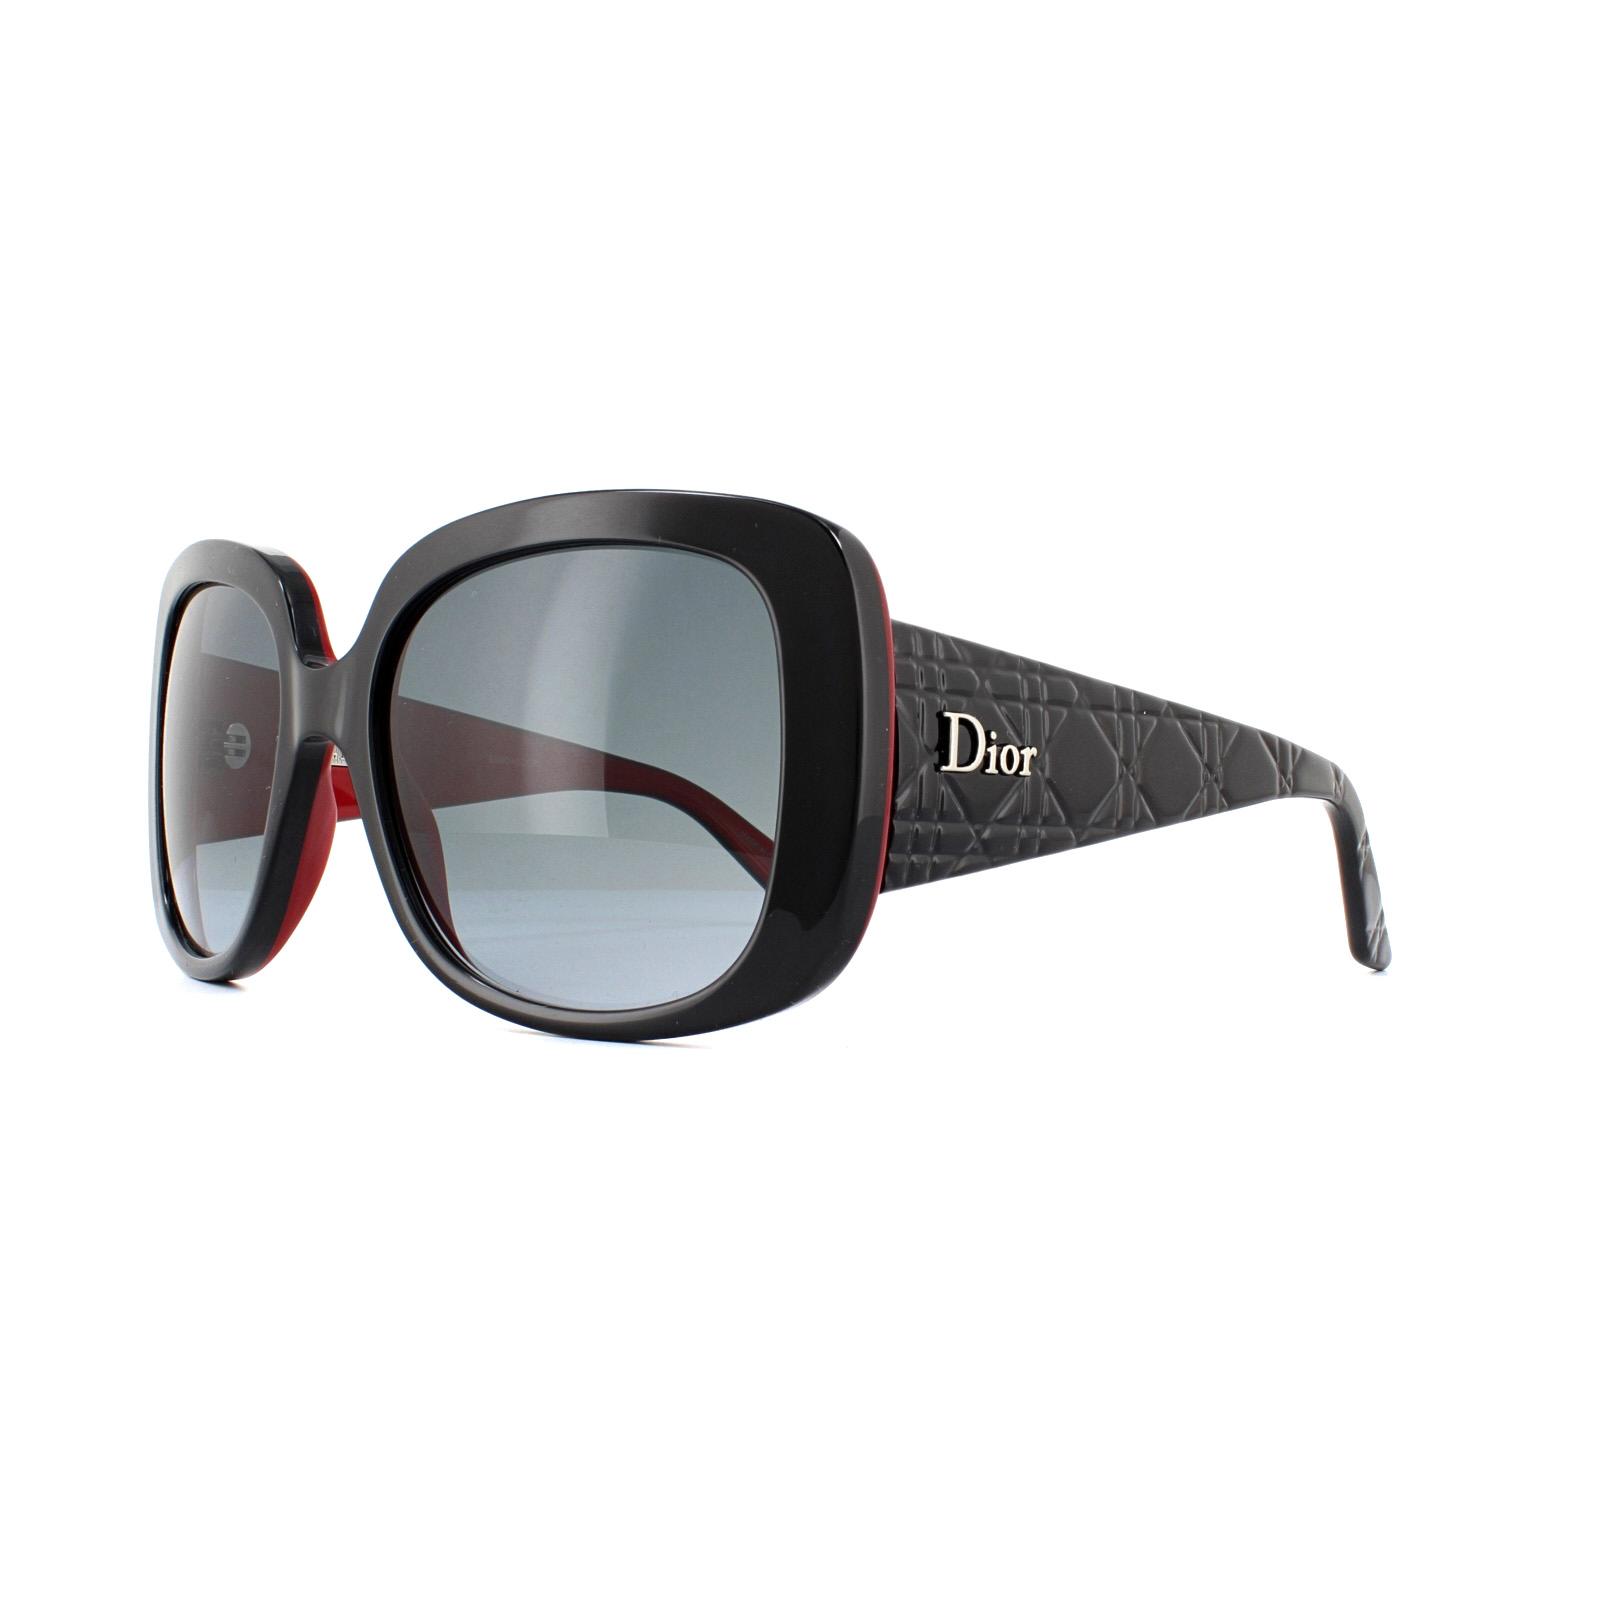 5c405a7b9ed Sentinel Dior Sunglasses Dior Lady Lady1D EL4 HD Black Grey Gradient